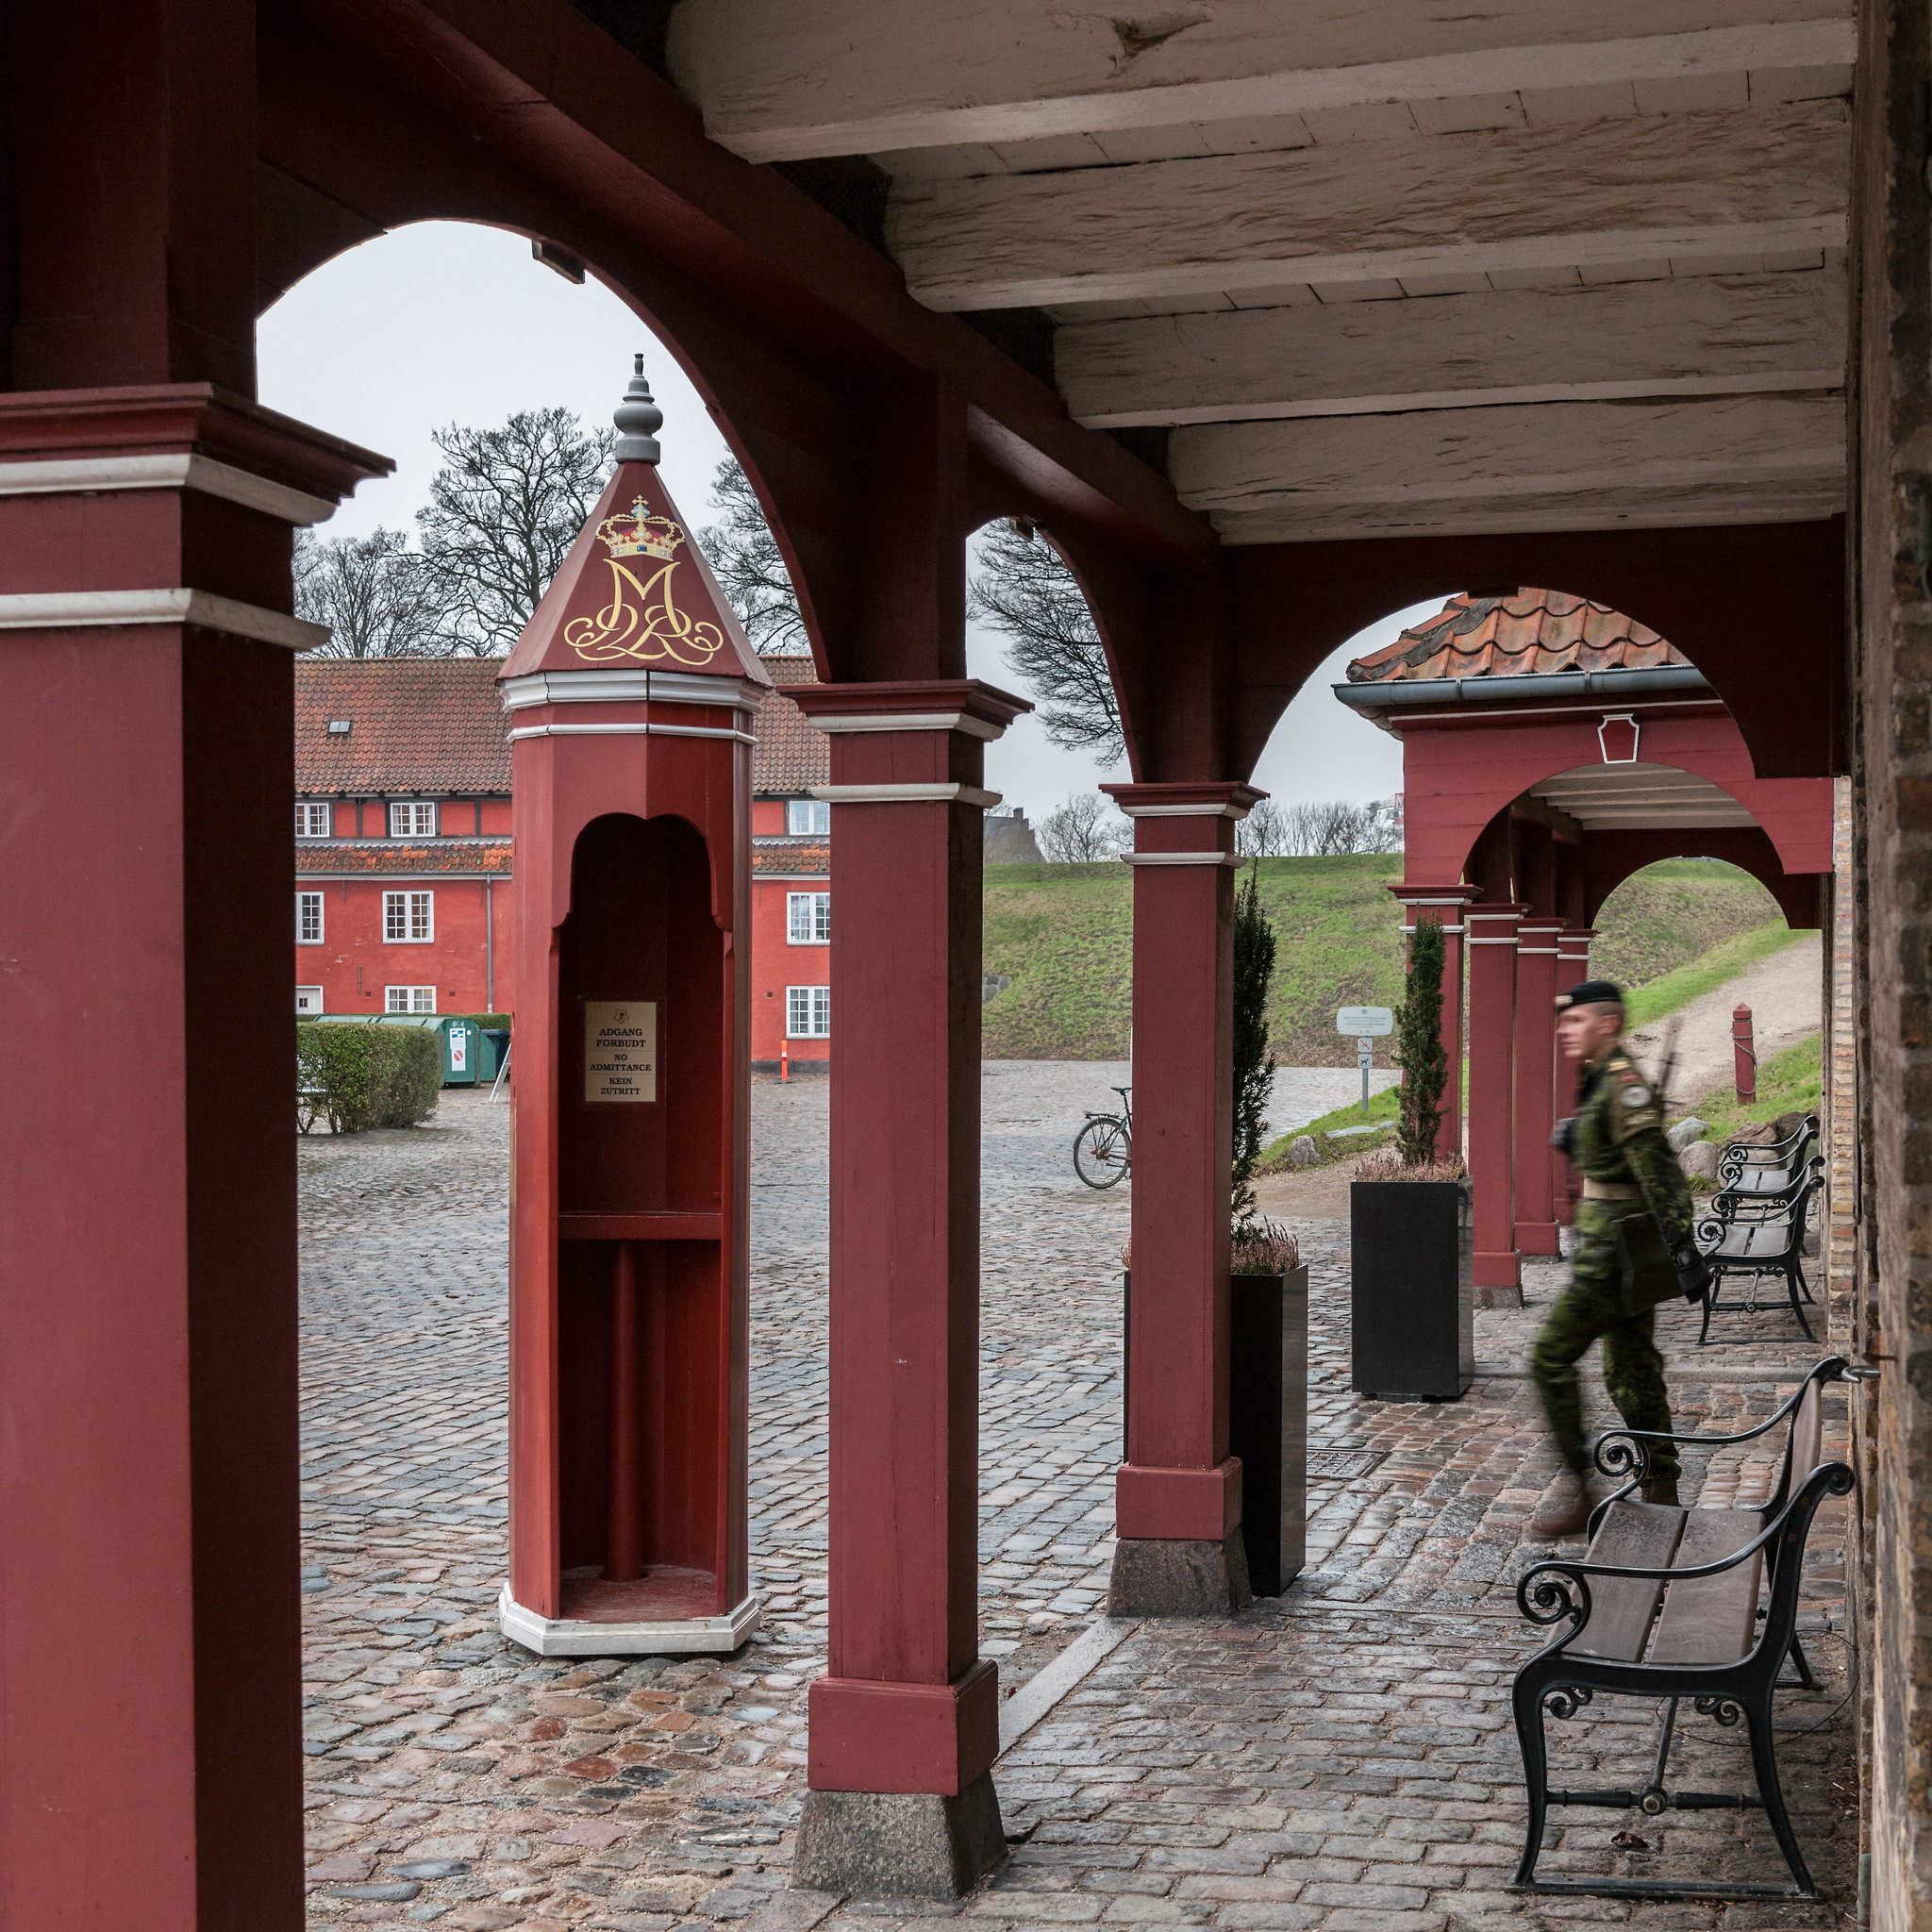 www iso Lund com